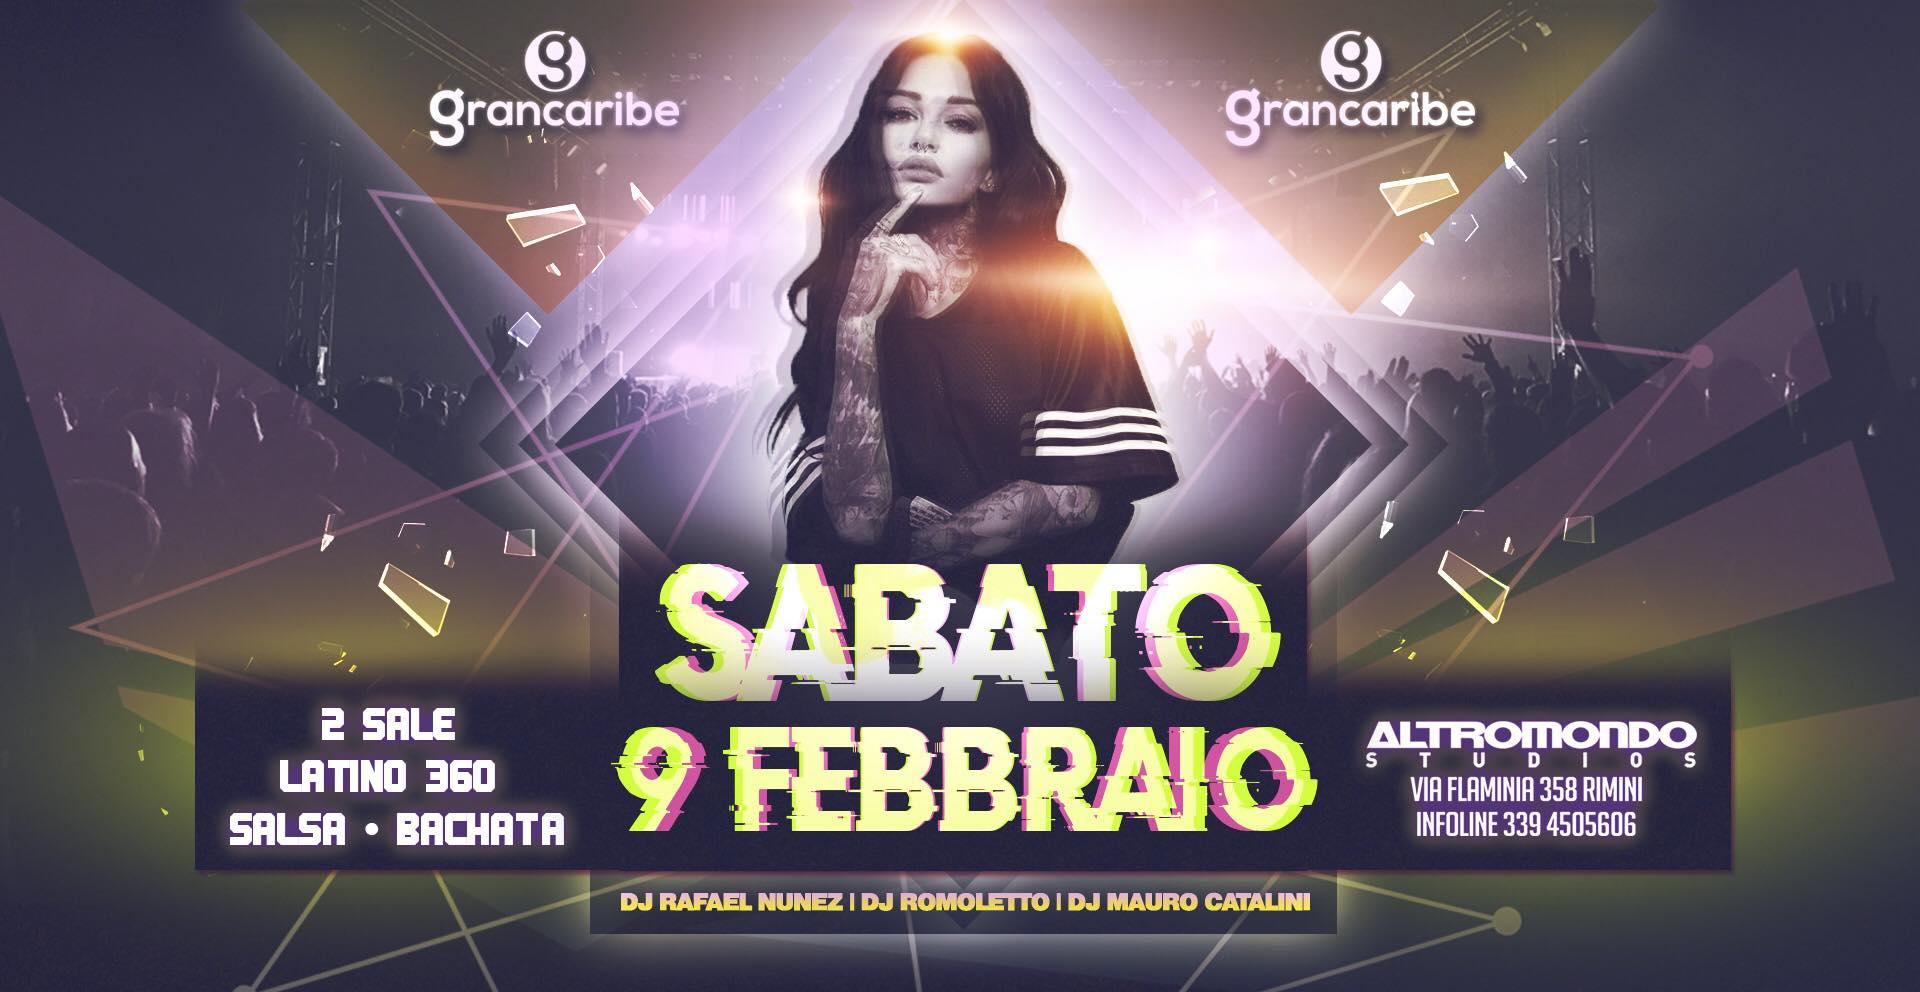 Discoteca Altromondo Studios Rimini Grancaribe